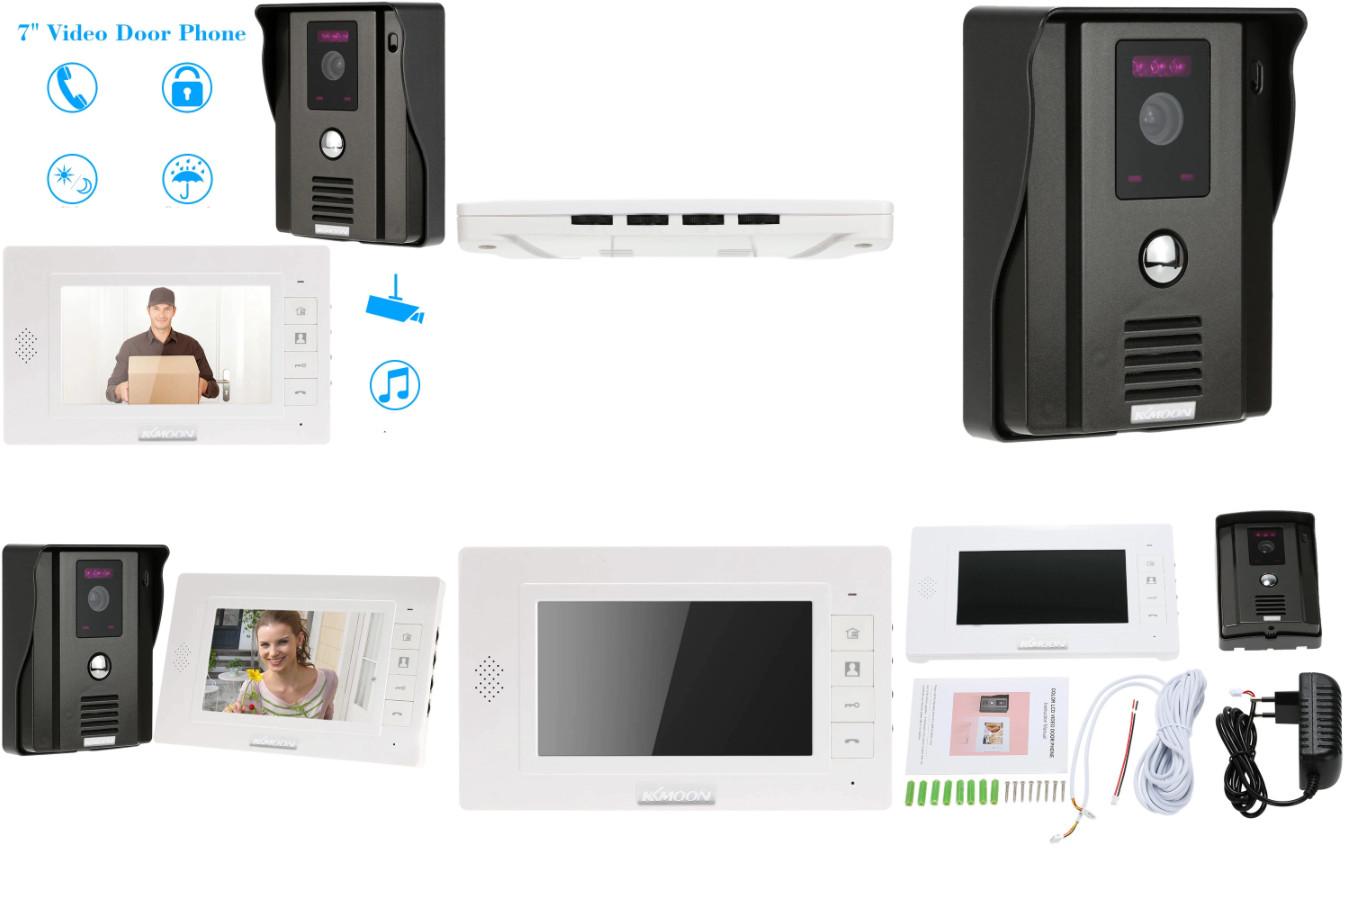 Видеодомофон с водонепроницаемым корпусом — KKmoon TFT LCD